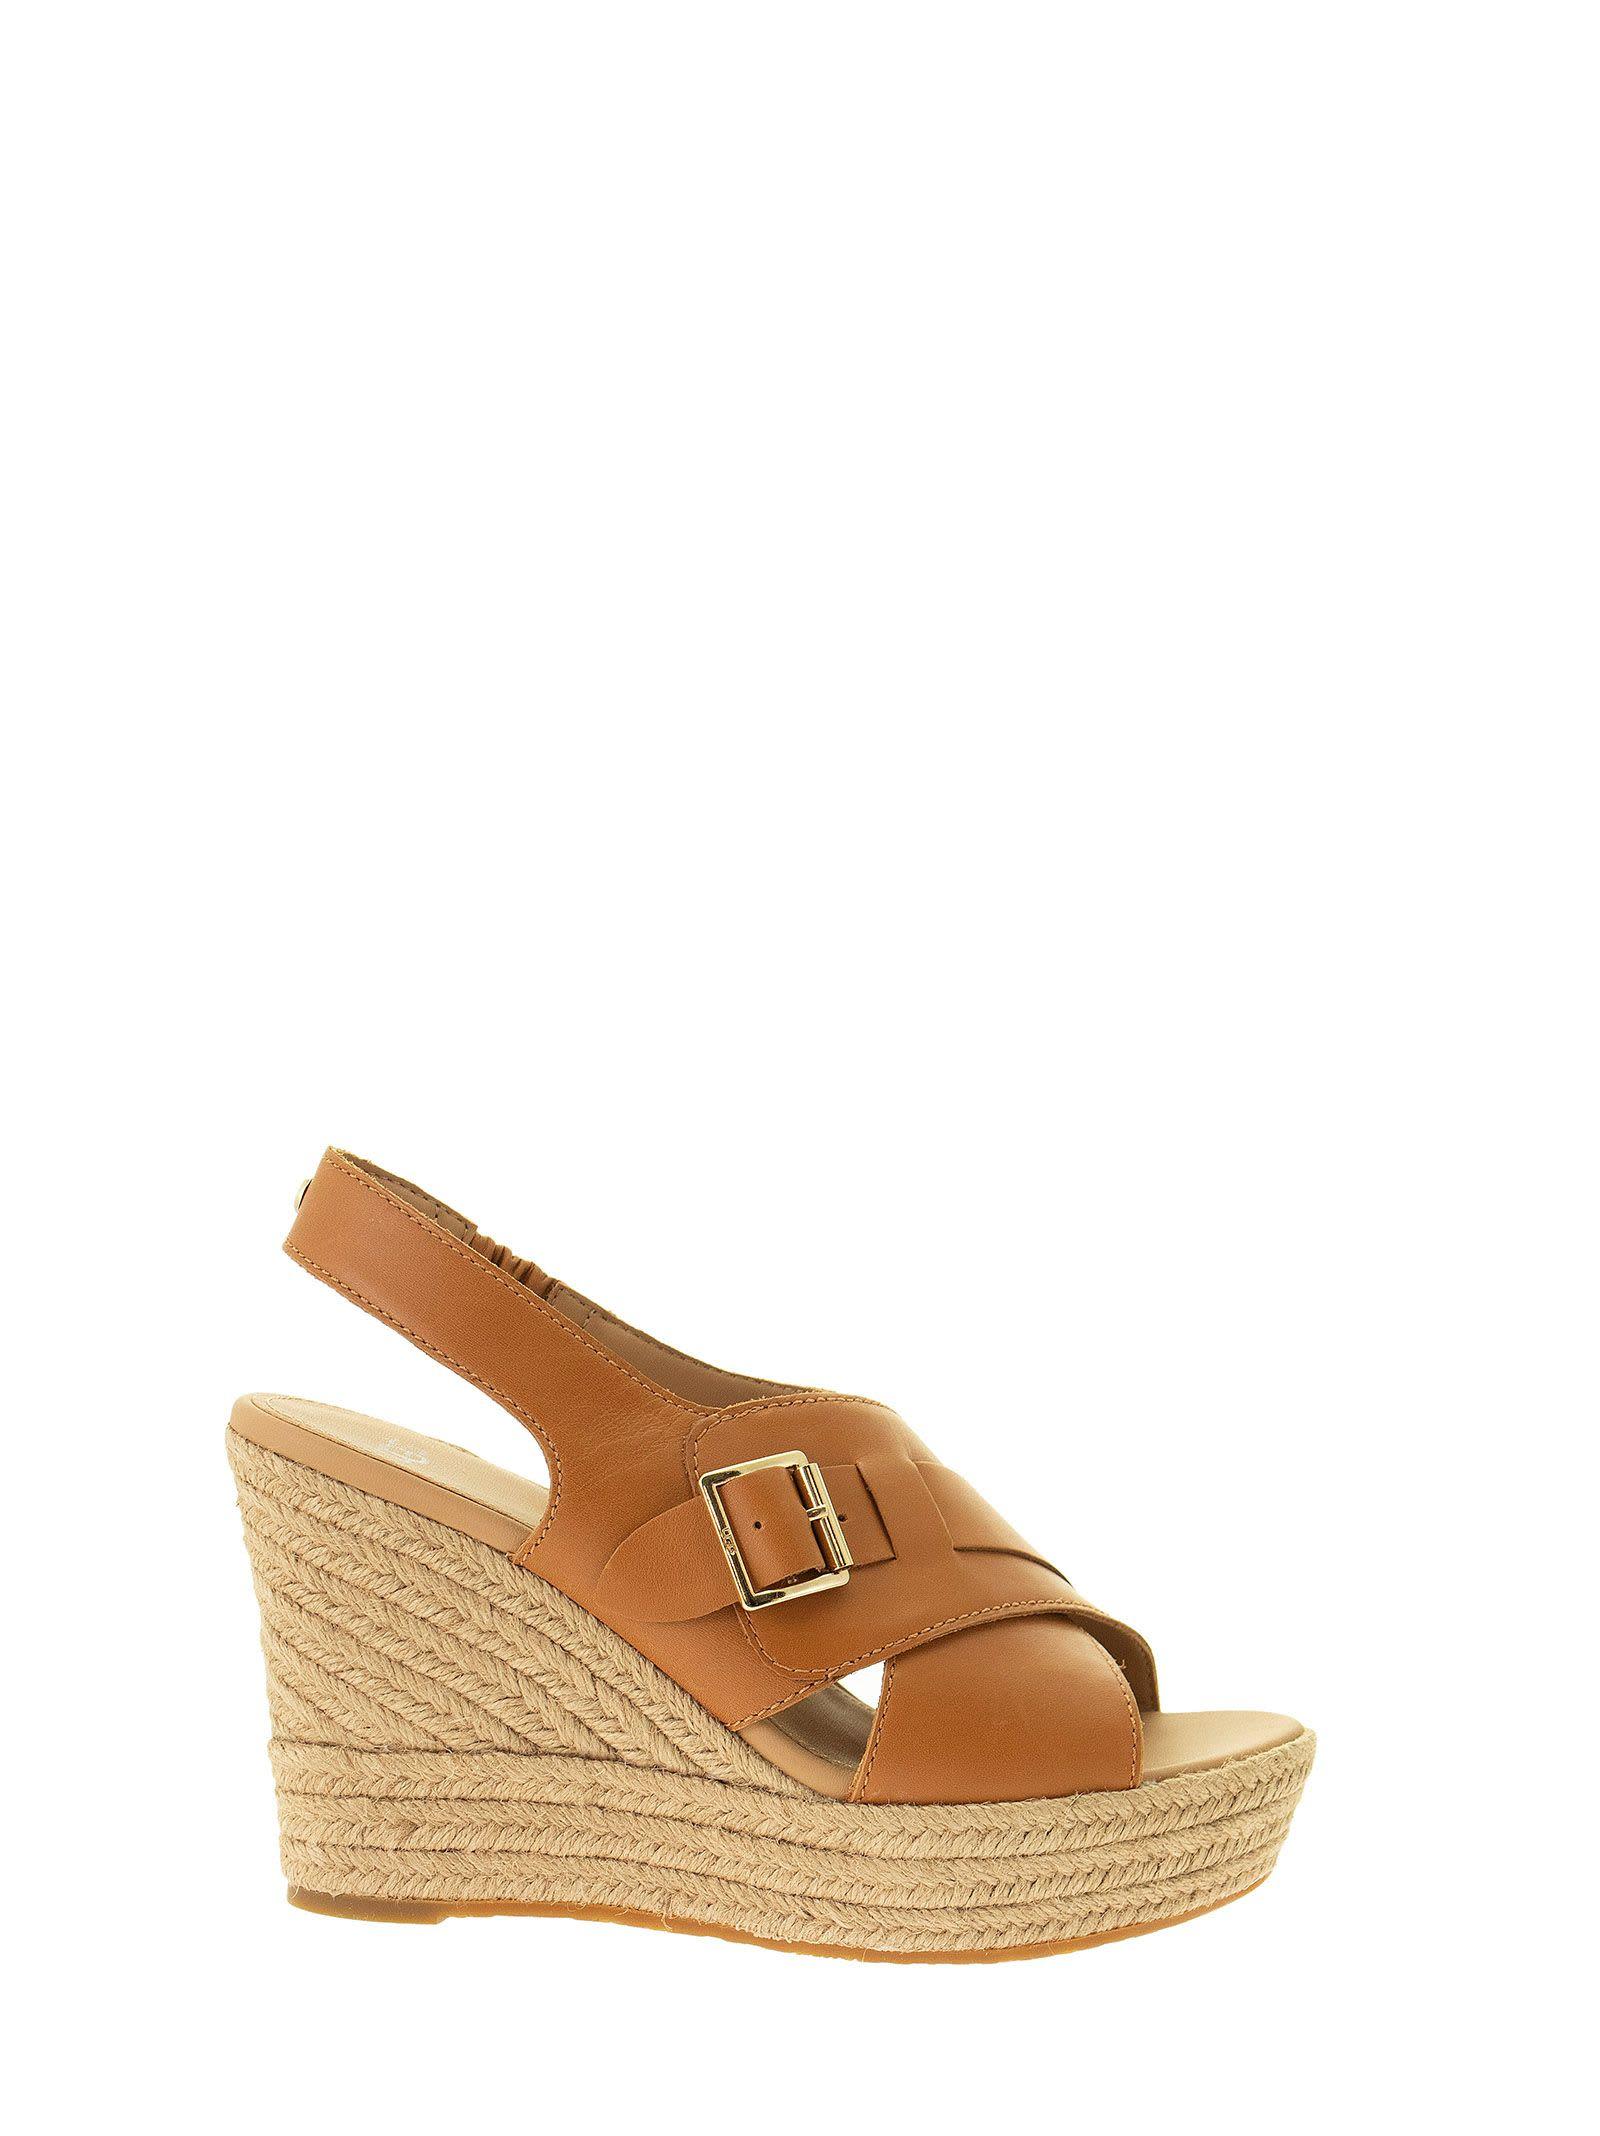 UGG Claudeene - Leather Sandal With Wedge